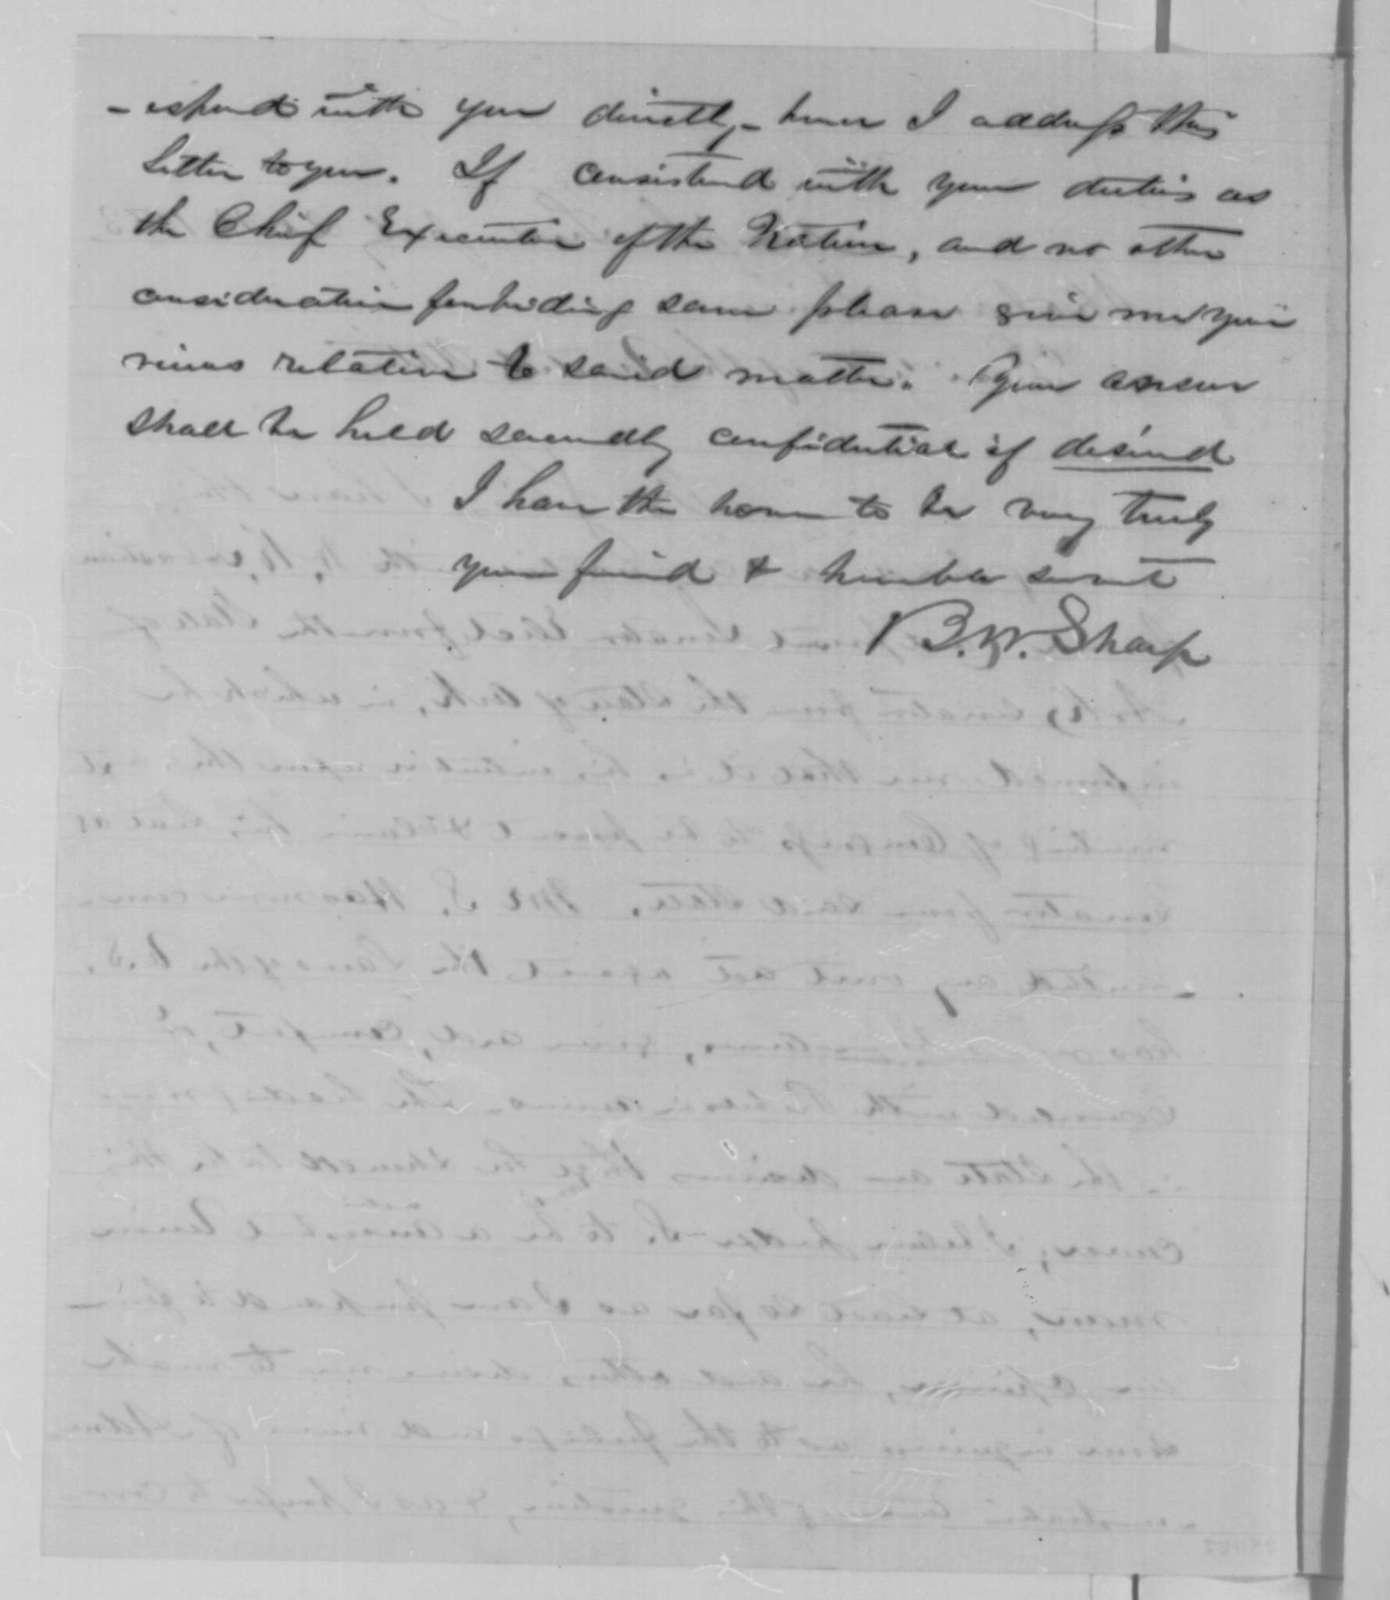 Benjamin W. Sharp to Abraham Lincoln, Monday, July 20, 1863  (Writes on behalf of William K. Sebastian)